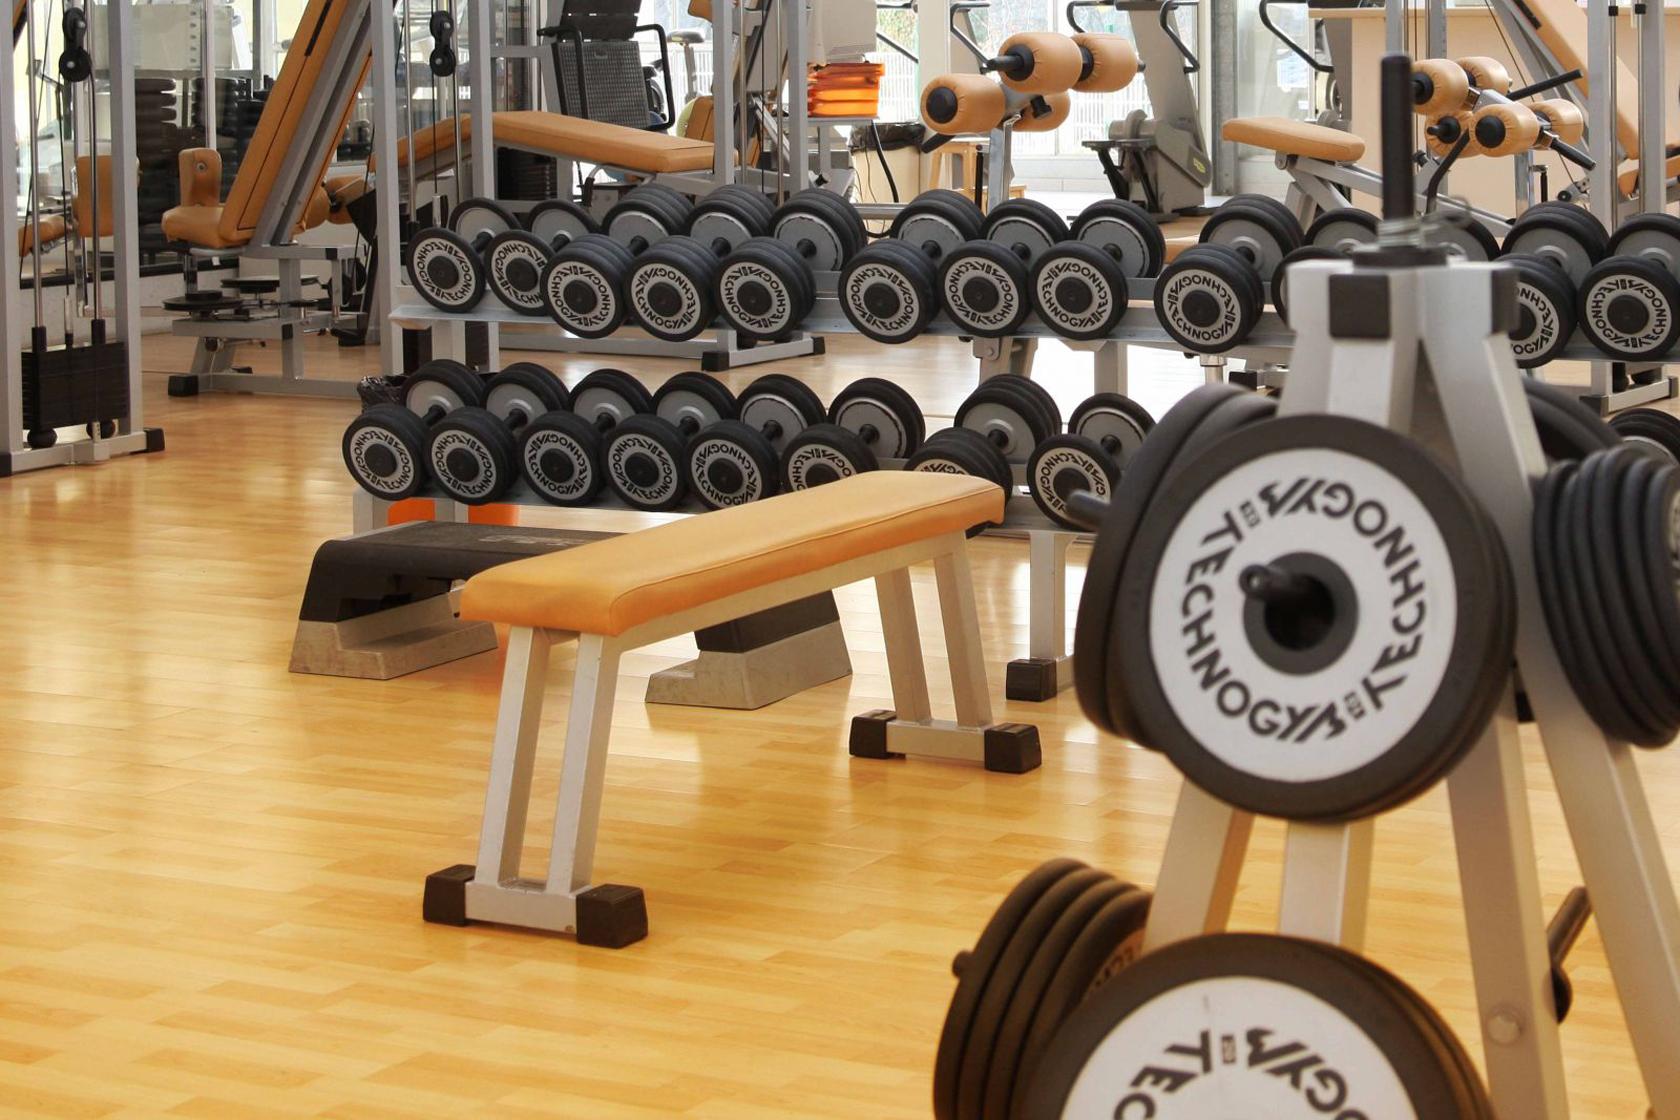 fitnessium